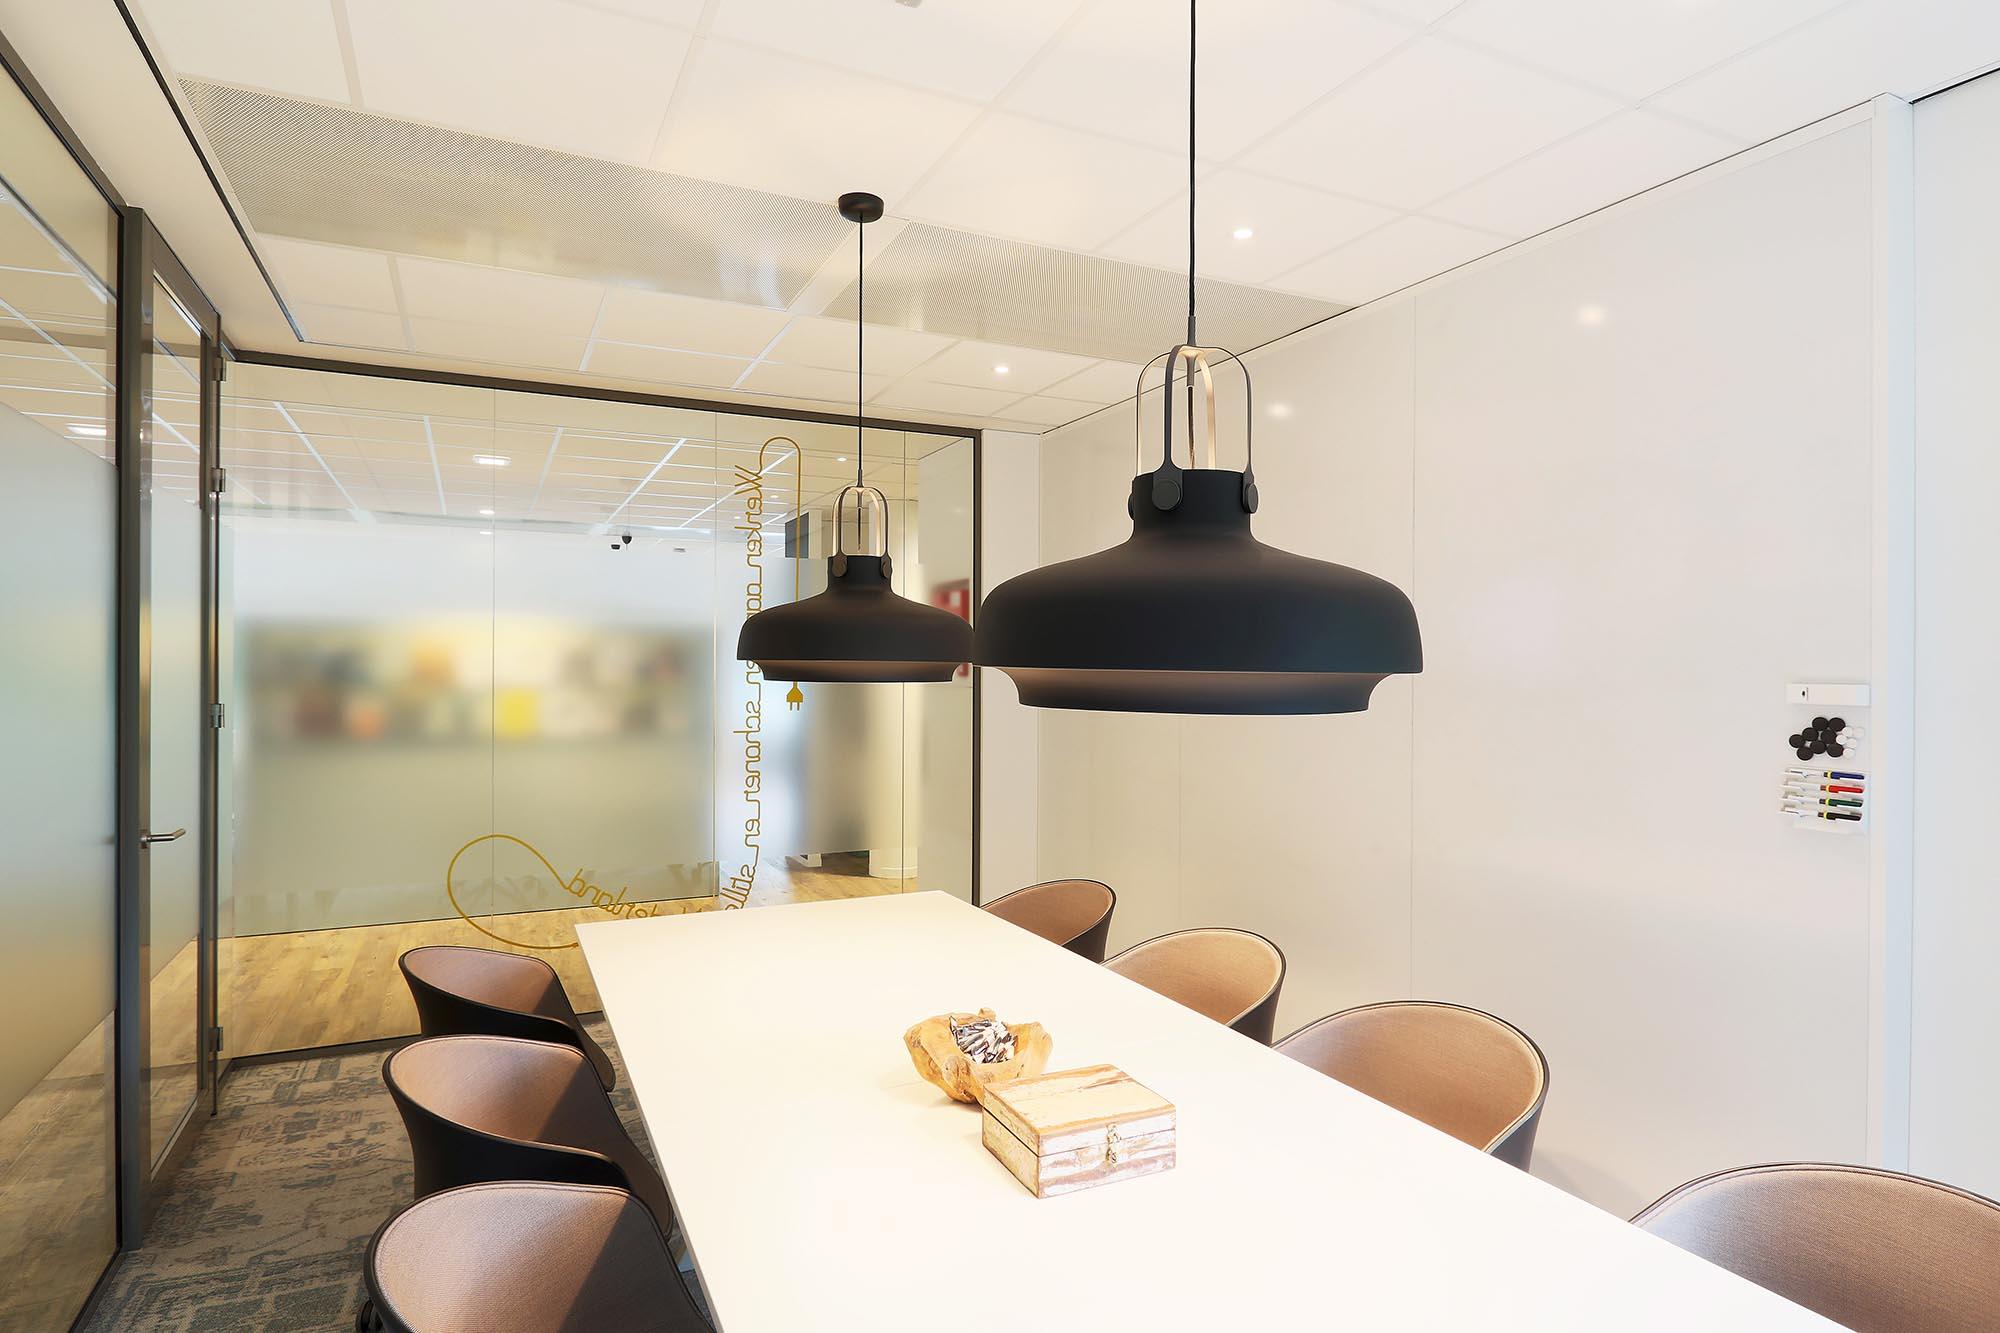 Stalen Systeemwand Whiteboard Wand Magneetwand Kantoor Intermontage